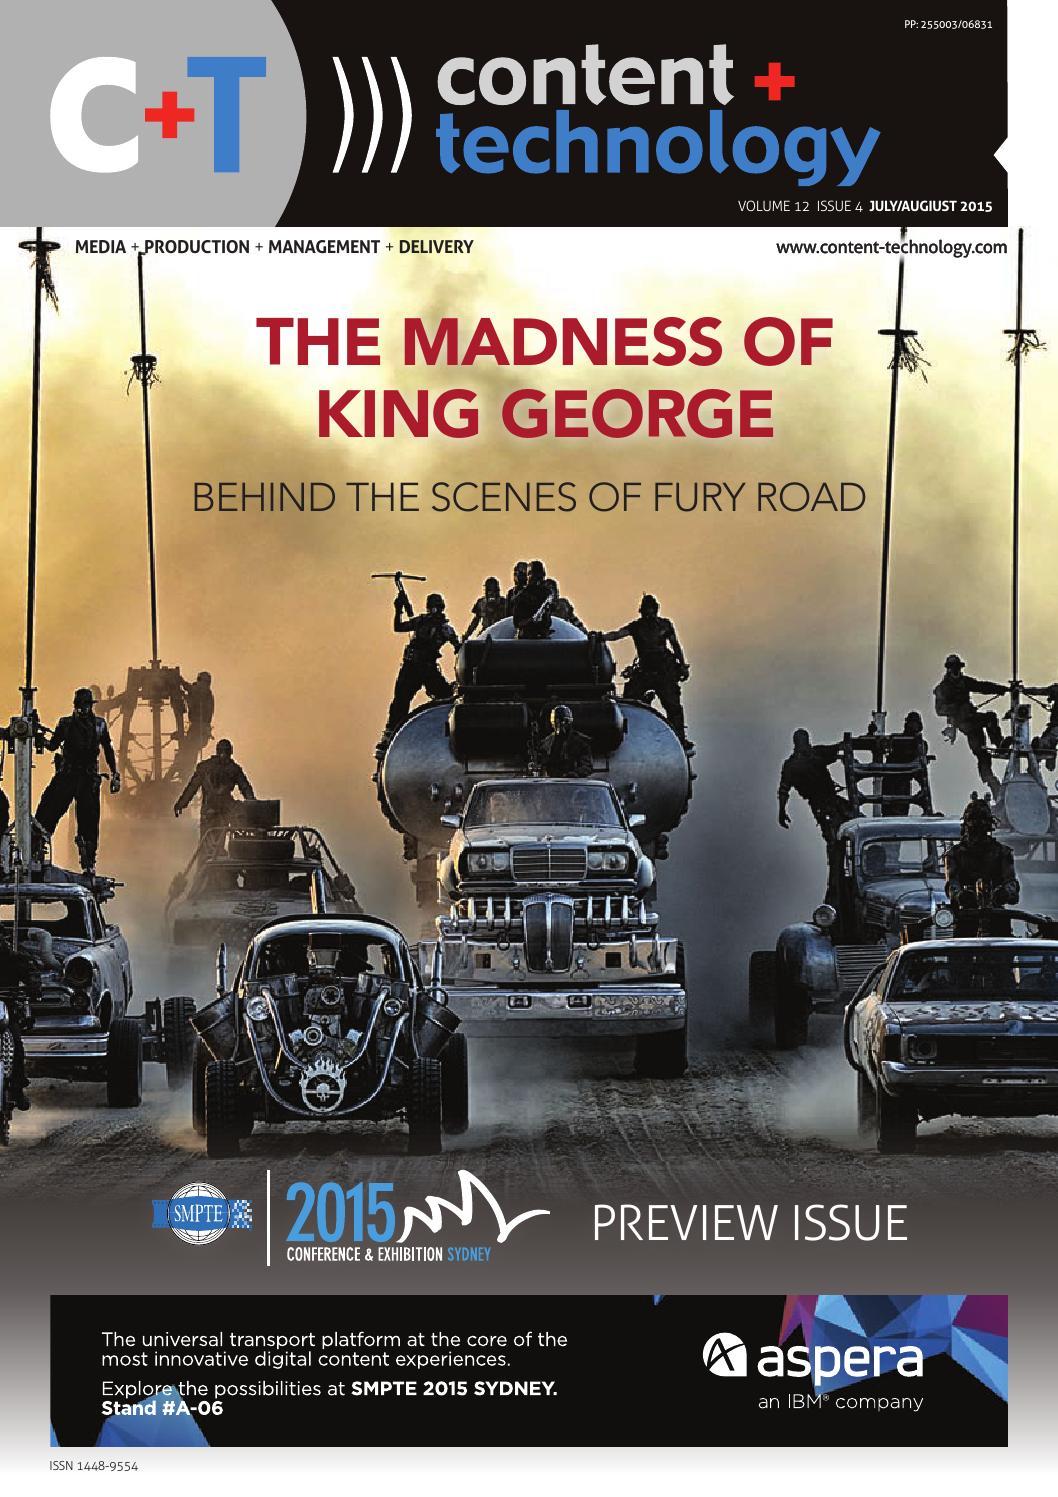 Mad Max Max Rockatansky Vinyl Decal Sticker for Car//Laptop//Consoles//Mirrorr